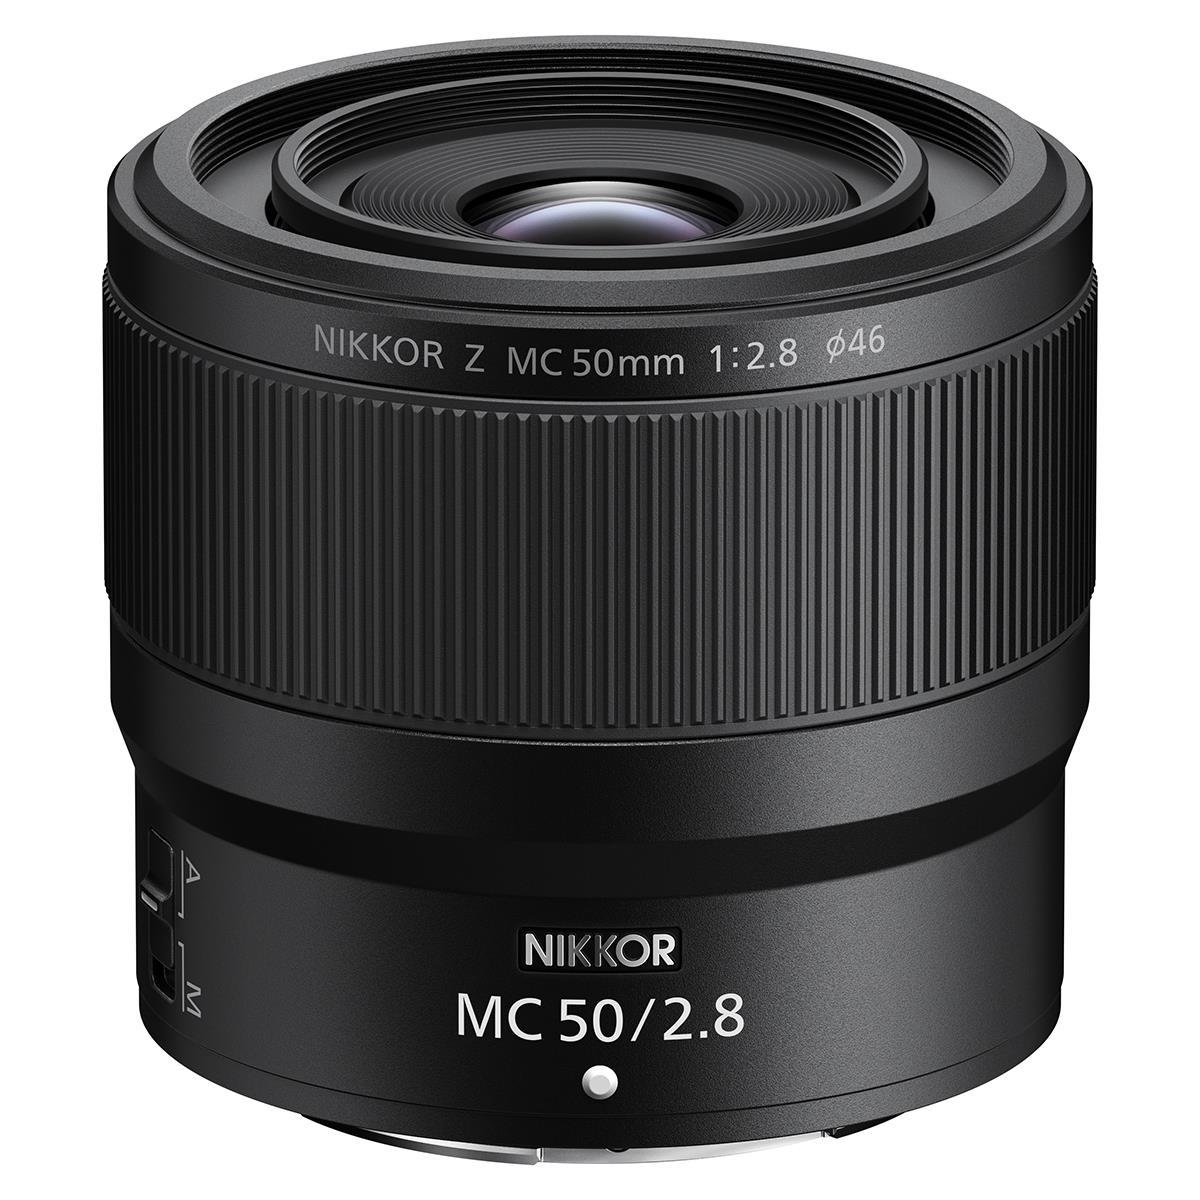 Nikon Z 50mm F2.8 MC Lens